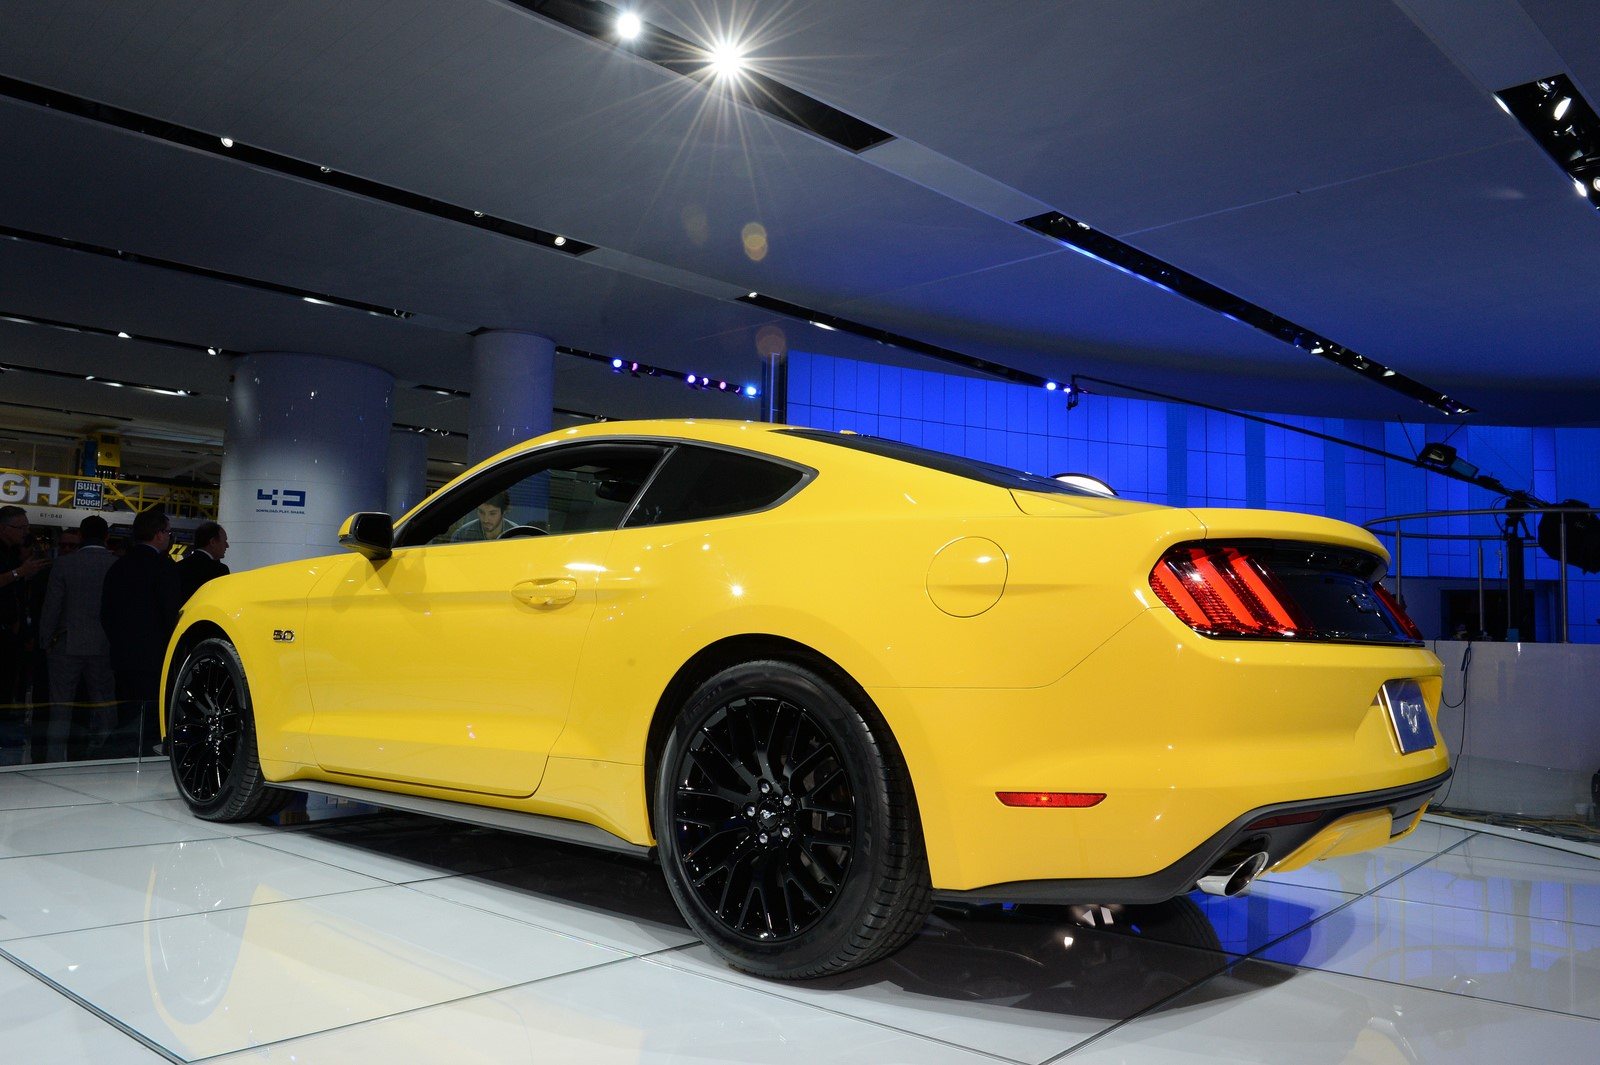 2015 Ford Mustang Convertible For Desktop Wallpaper Download 1600x1065